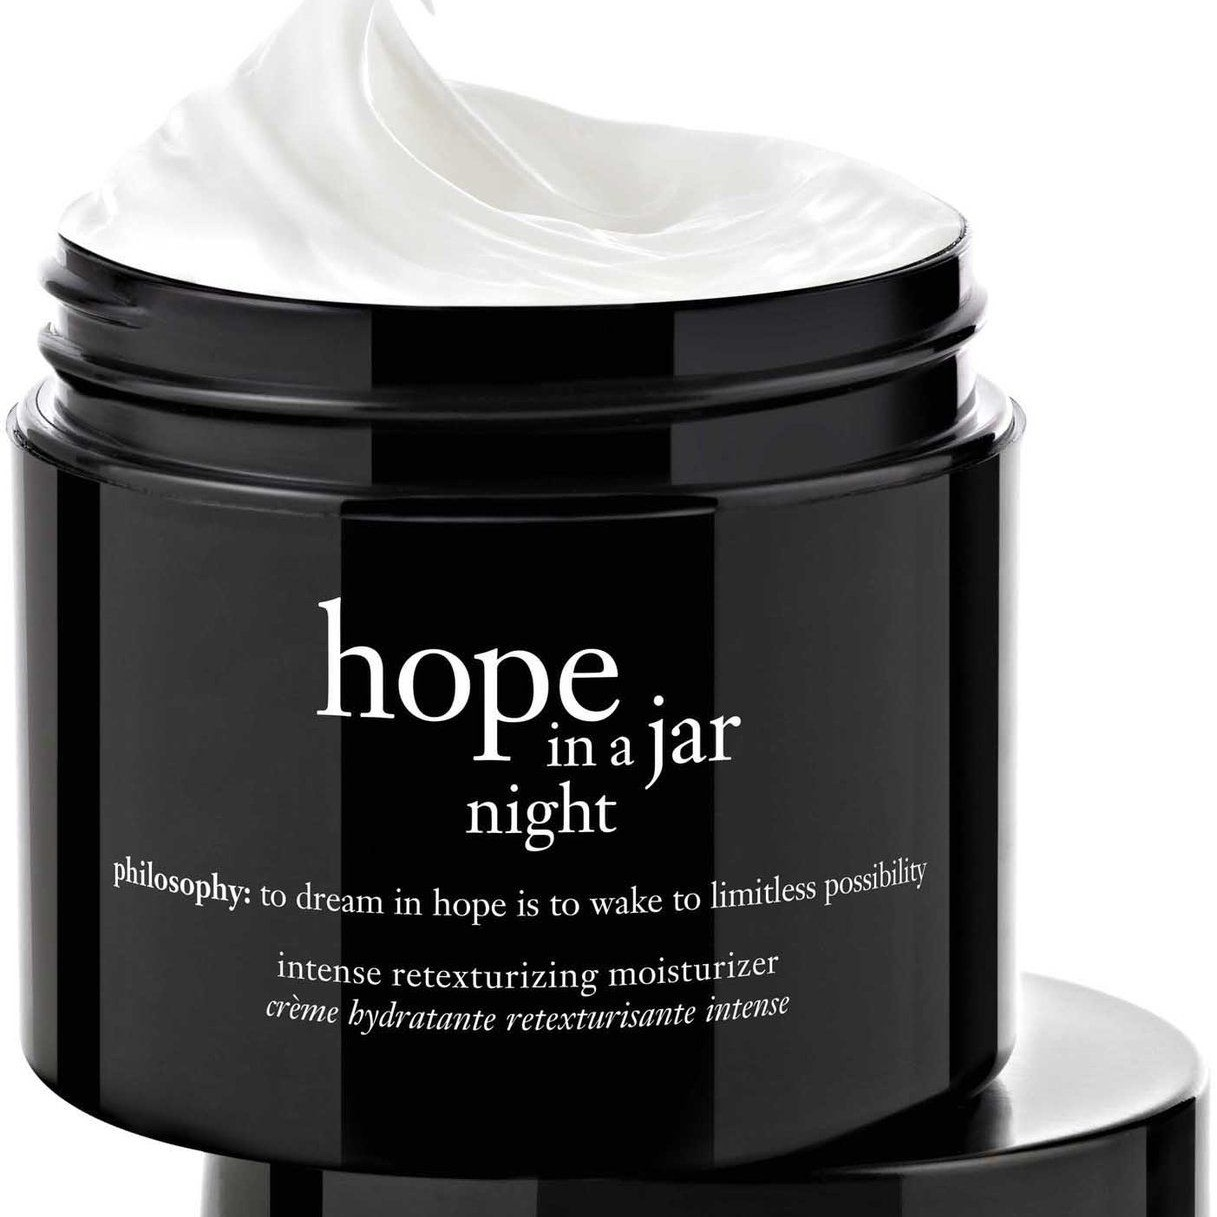 philosophy Hope in a Jar Night (Intense retexturing moisturizer)